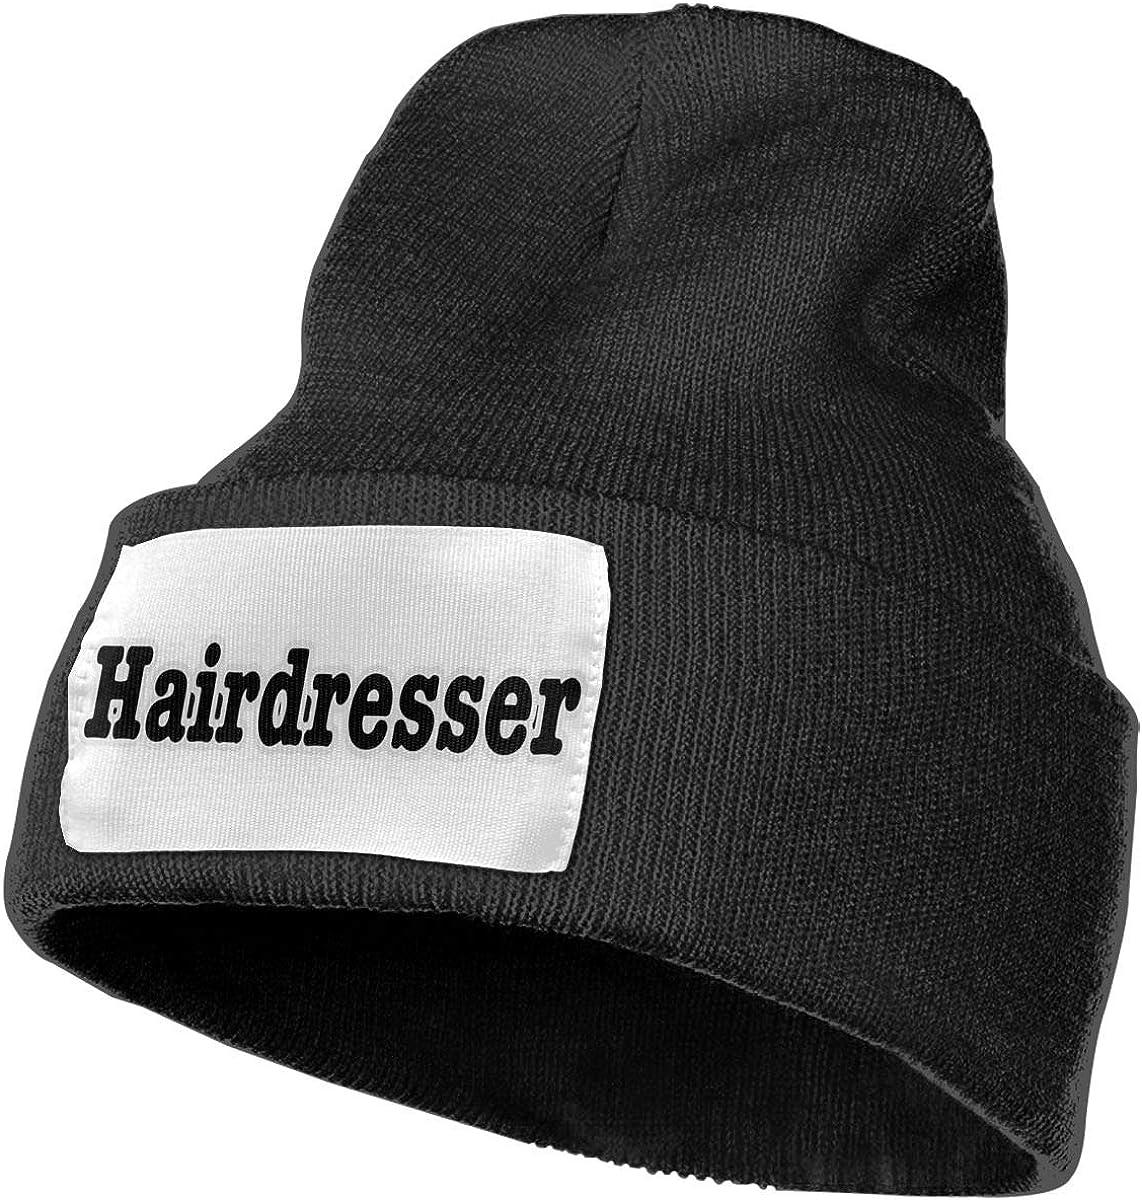 TAOMAP89 Hairdresser Men /& Women Skull Caps Winter Warm Stretchy Knitting Beanie Hats